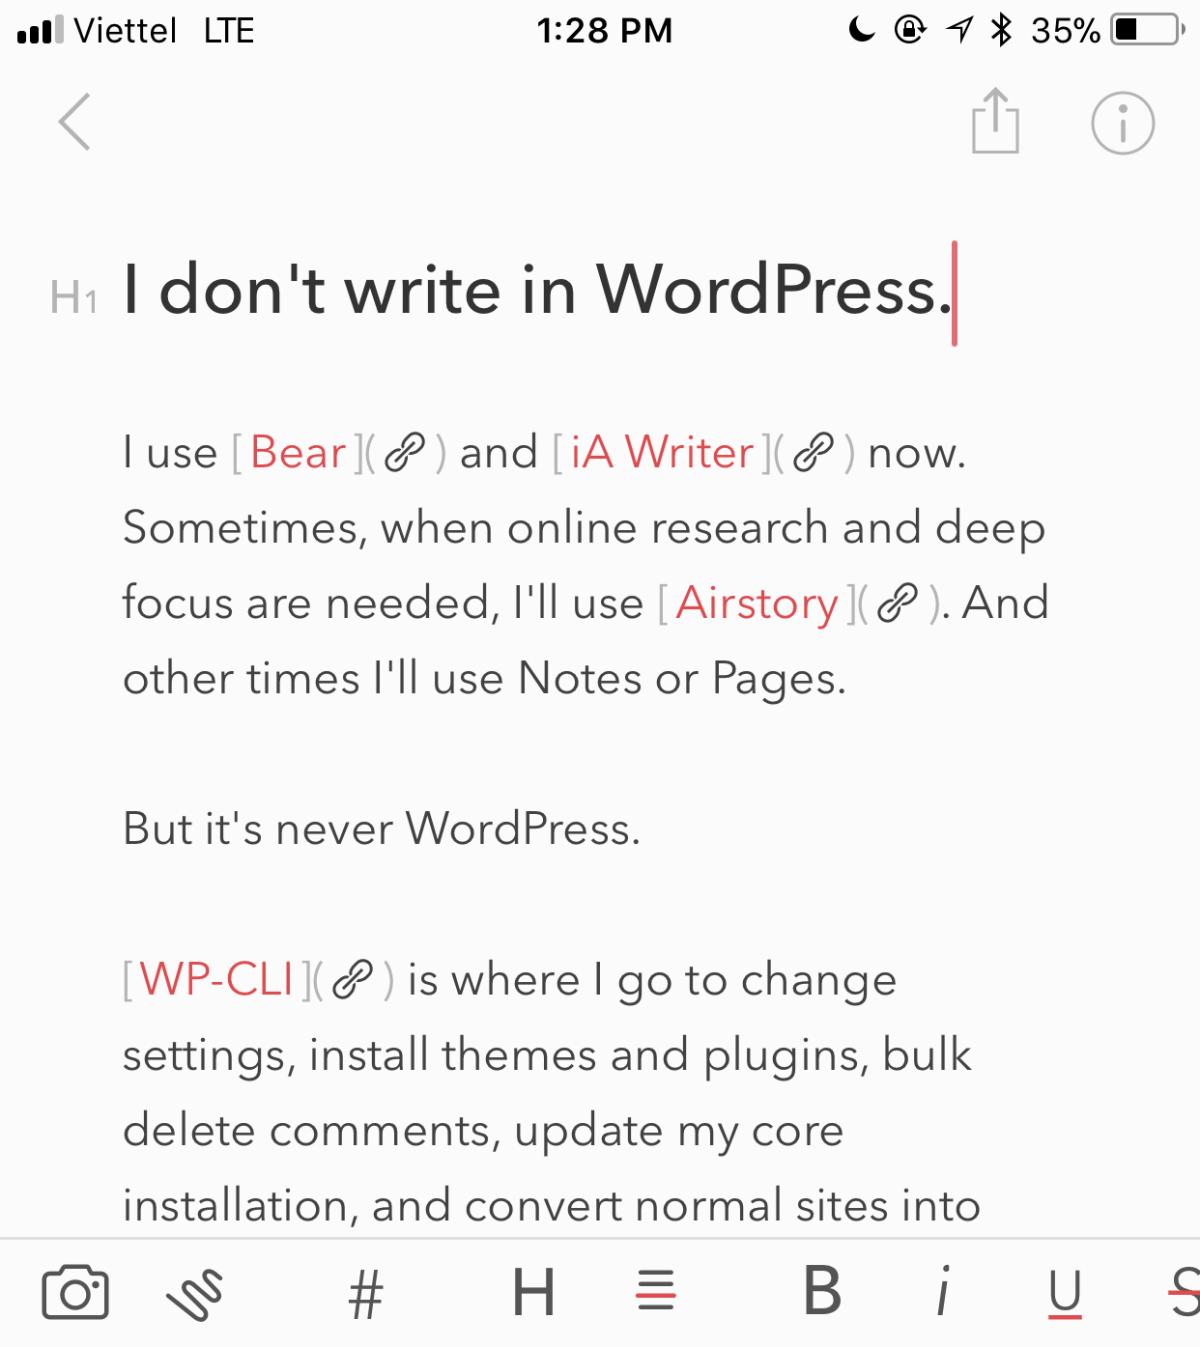 I Don't Write inWordPress